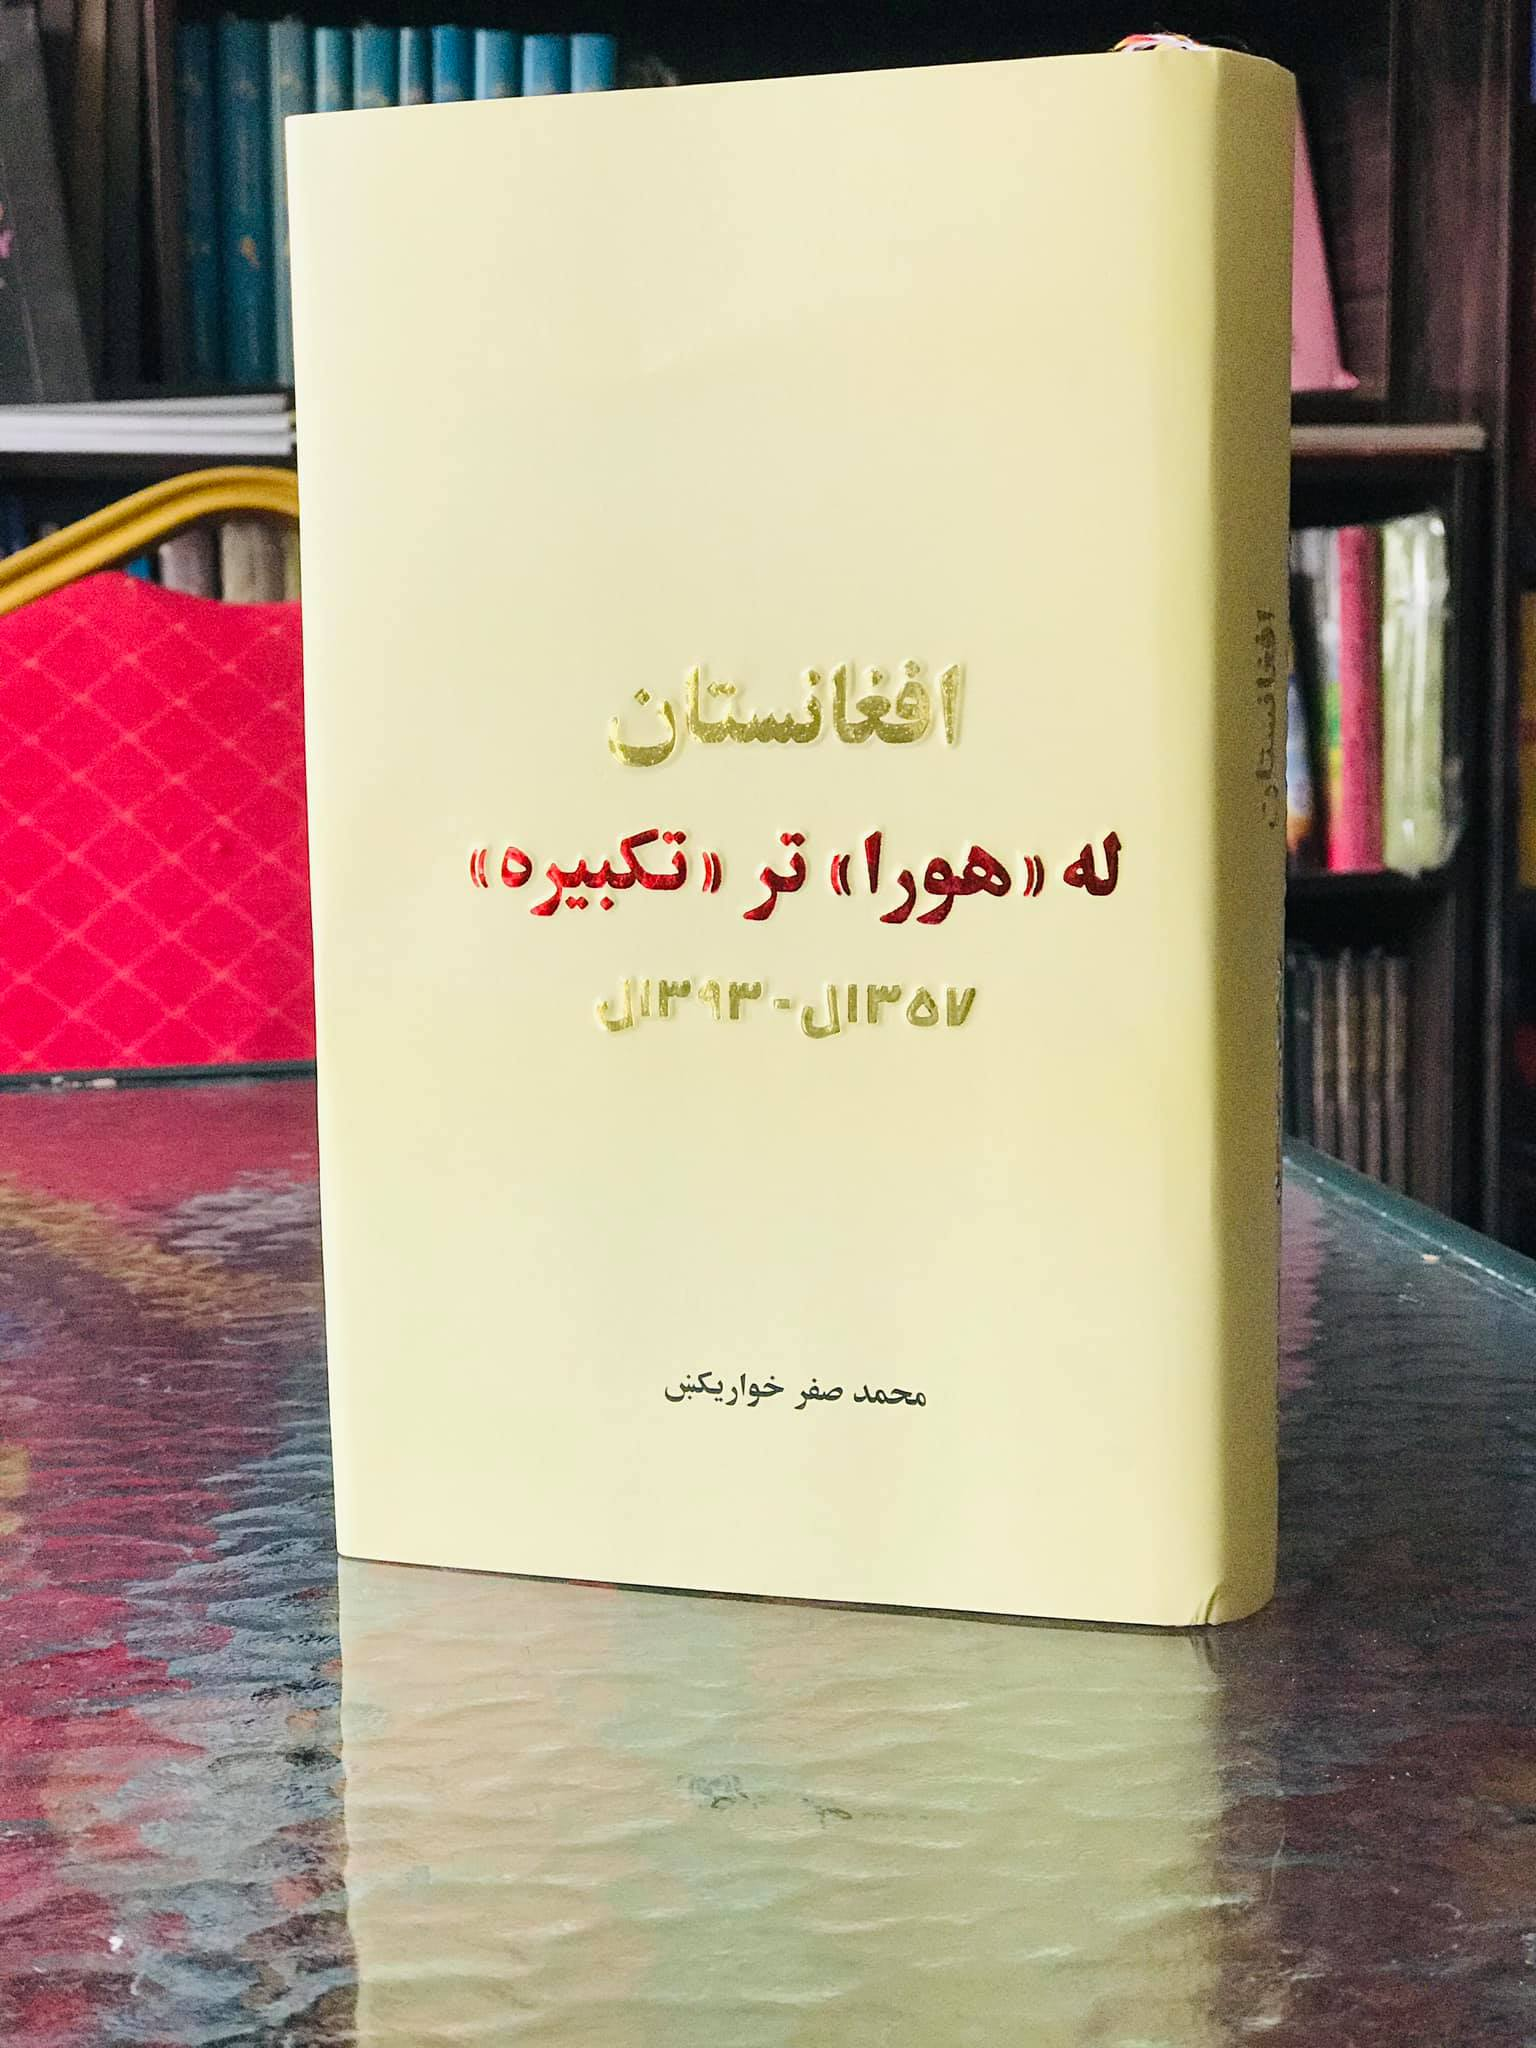 افغانستان له «هورا» تر «تکبيره» چاپ شو